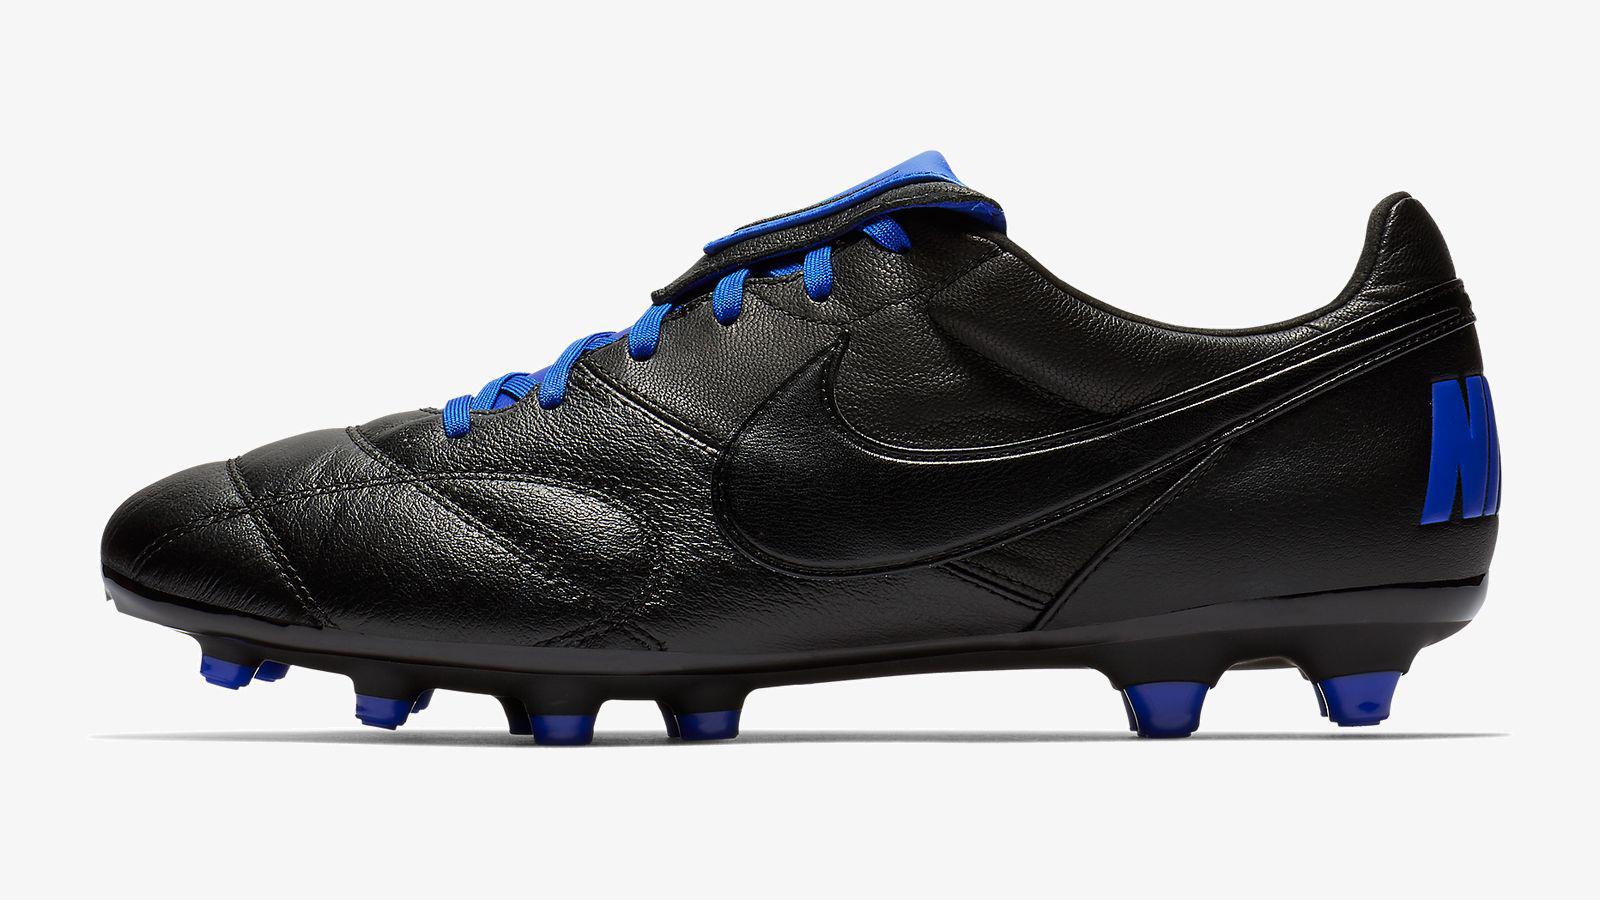 black-racer-blue-nike-premier-ii-boots-4